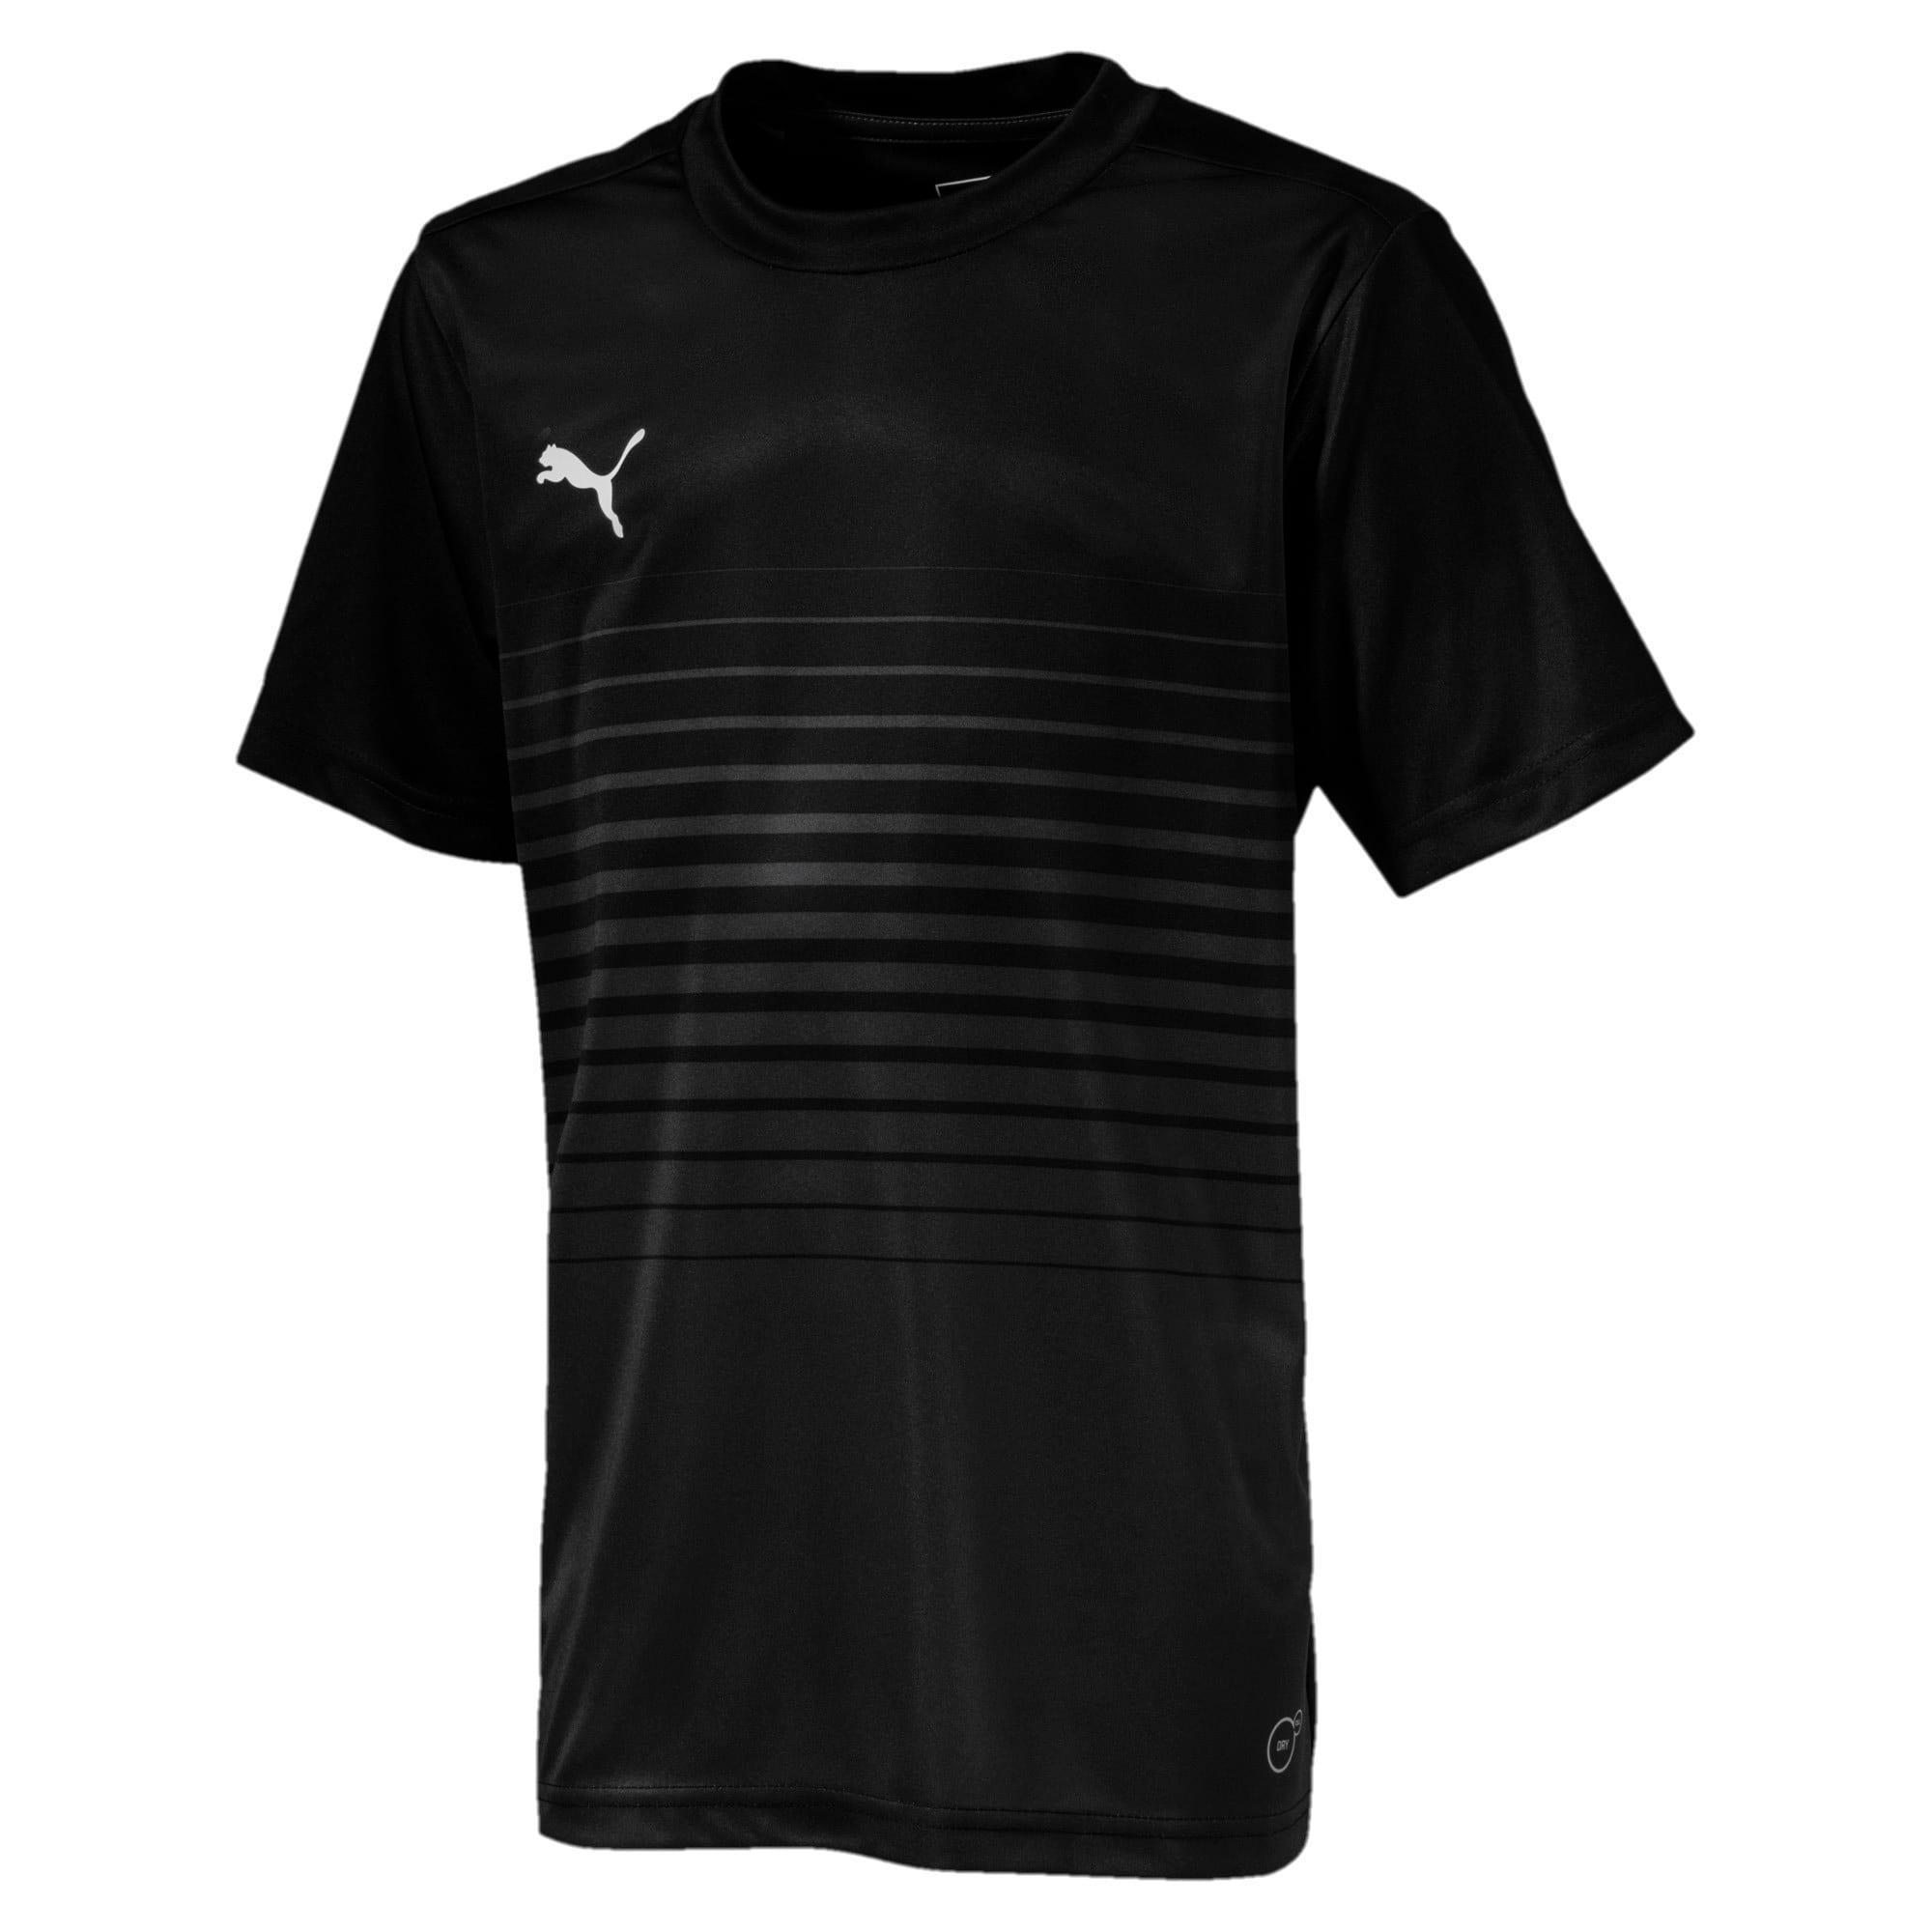 Thumbnail 1 of ftblPLAY Graphic Boys' Shirt, Asphalt-Puma Black, medium